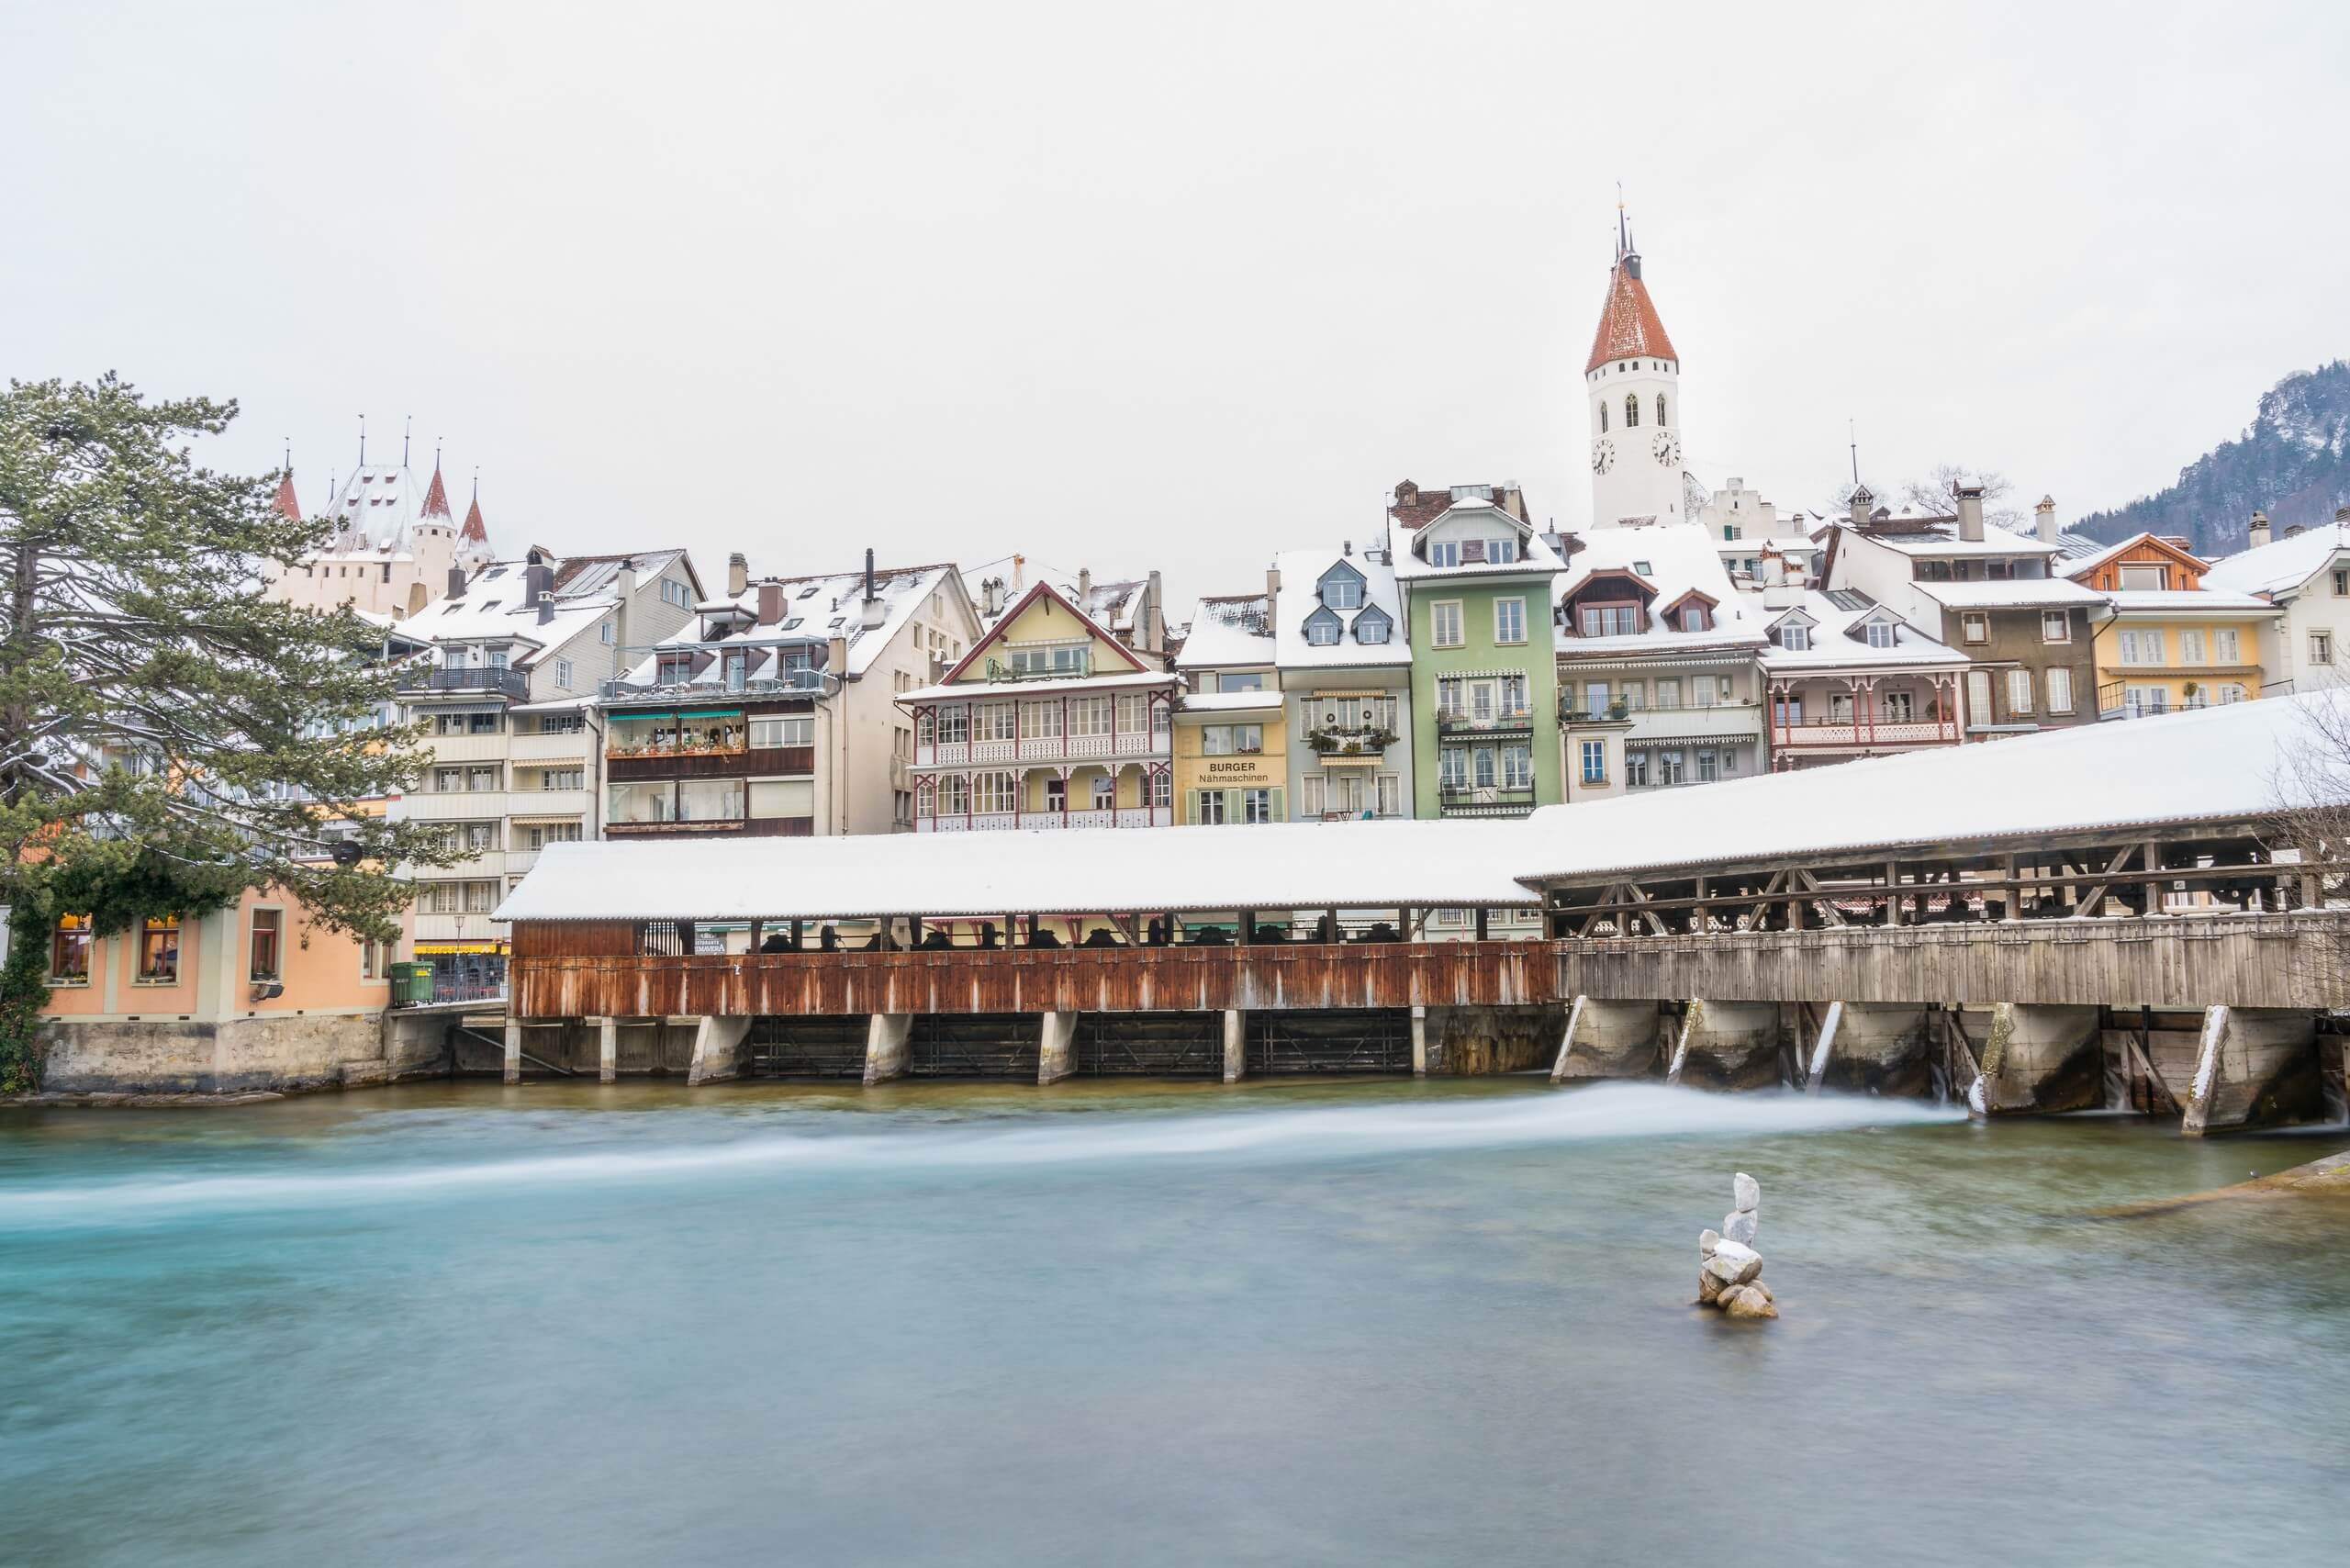 thun-schleuse-winter-schnee-aare-schloss-kirche-regenwettertipps-winterausfluege